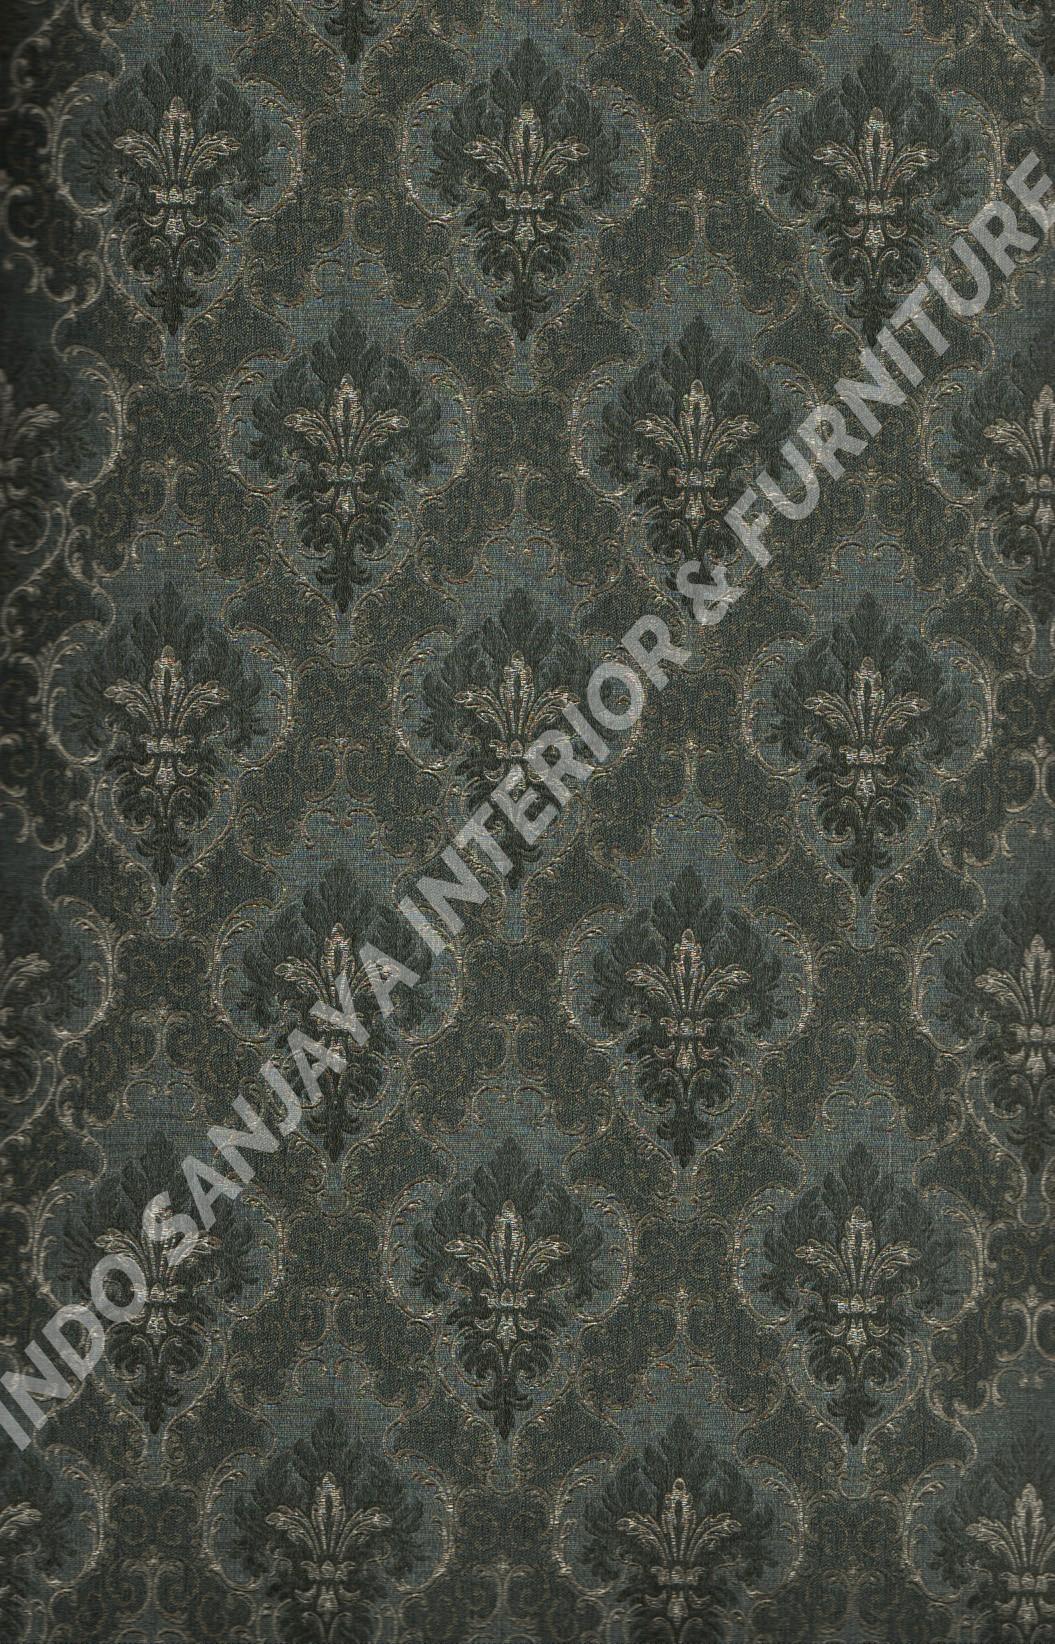 wallpaper CASABENE:2573-8 corak Klasik / Batik (Damask) warna Hitam ,Hijau